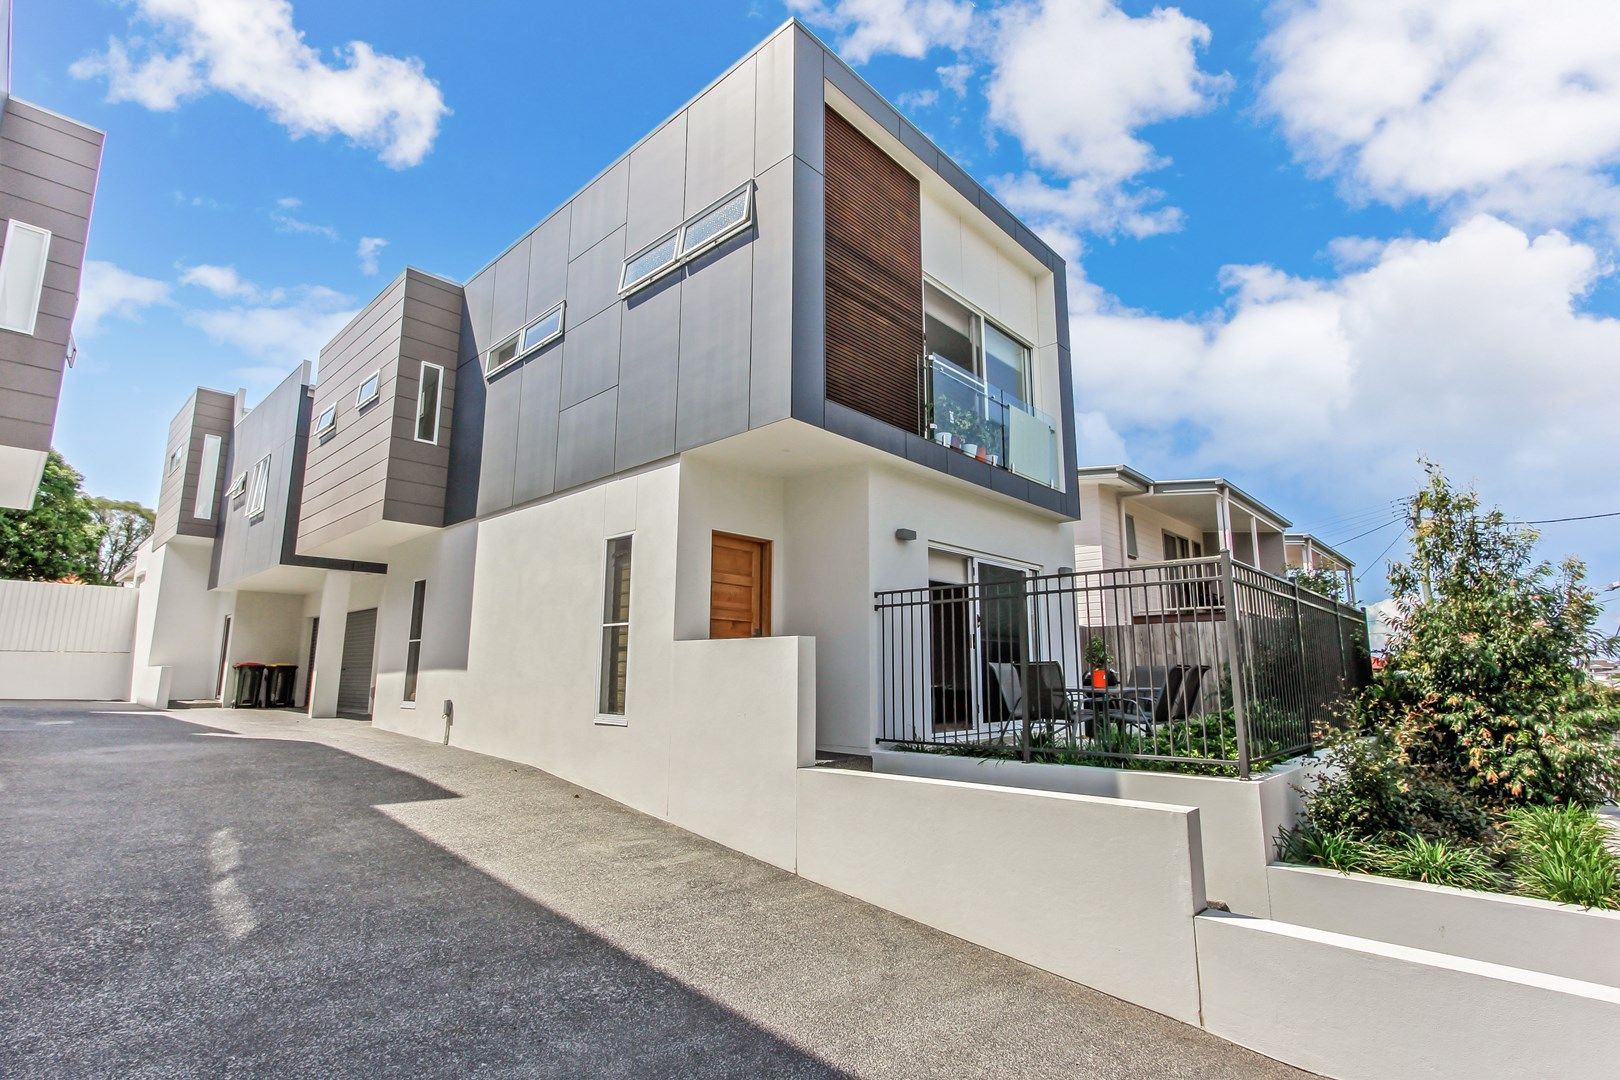 1/18 Booligal Street, Carina QLD 4152, Image 0